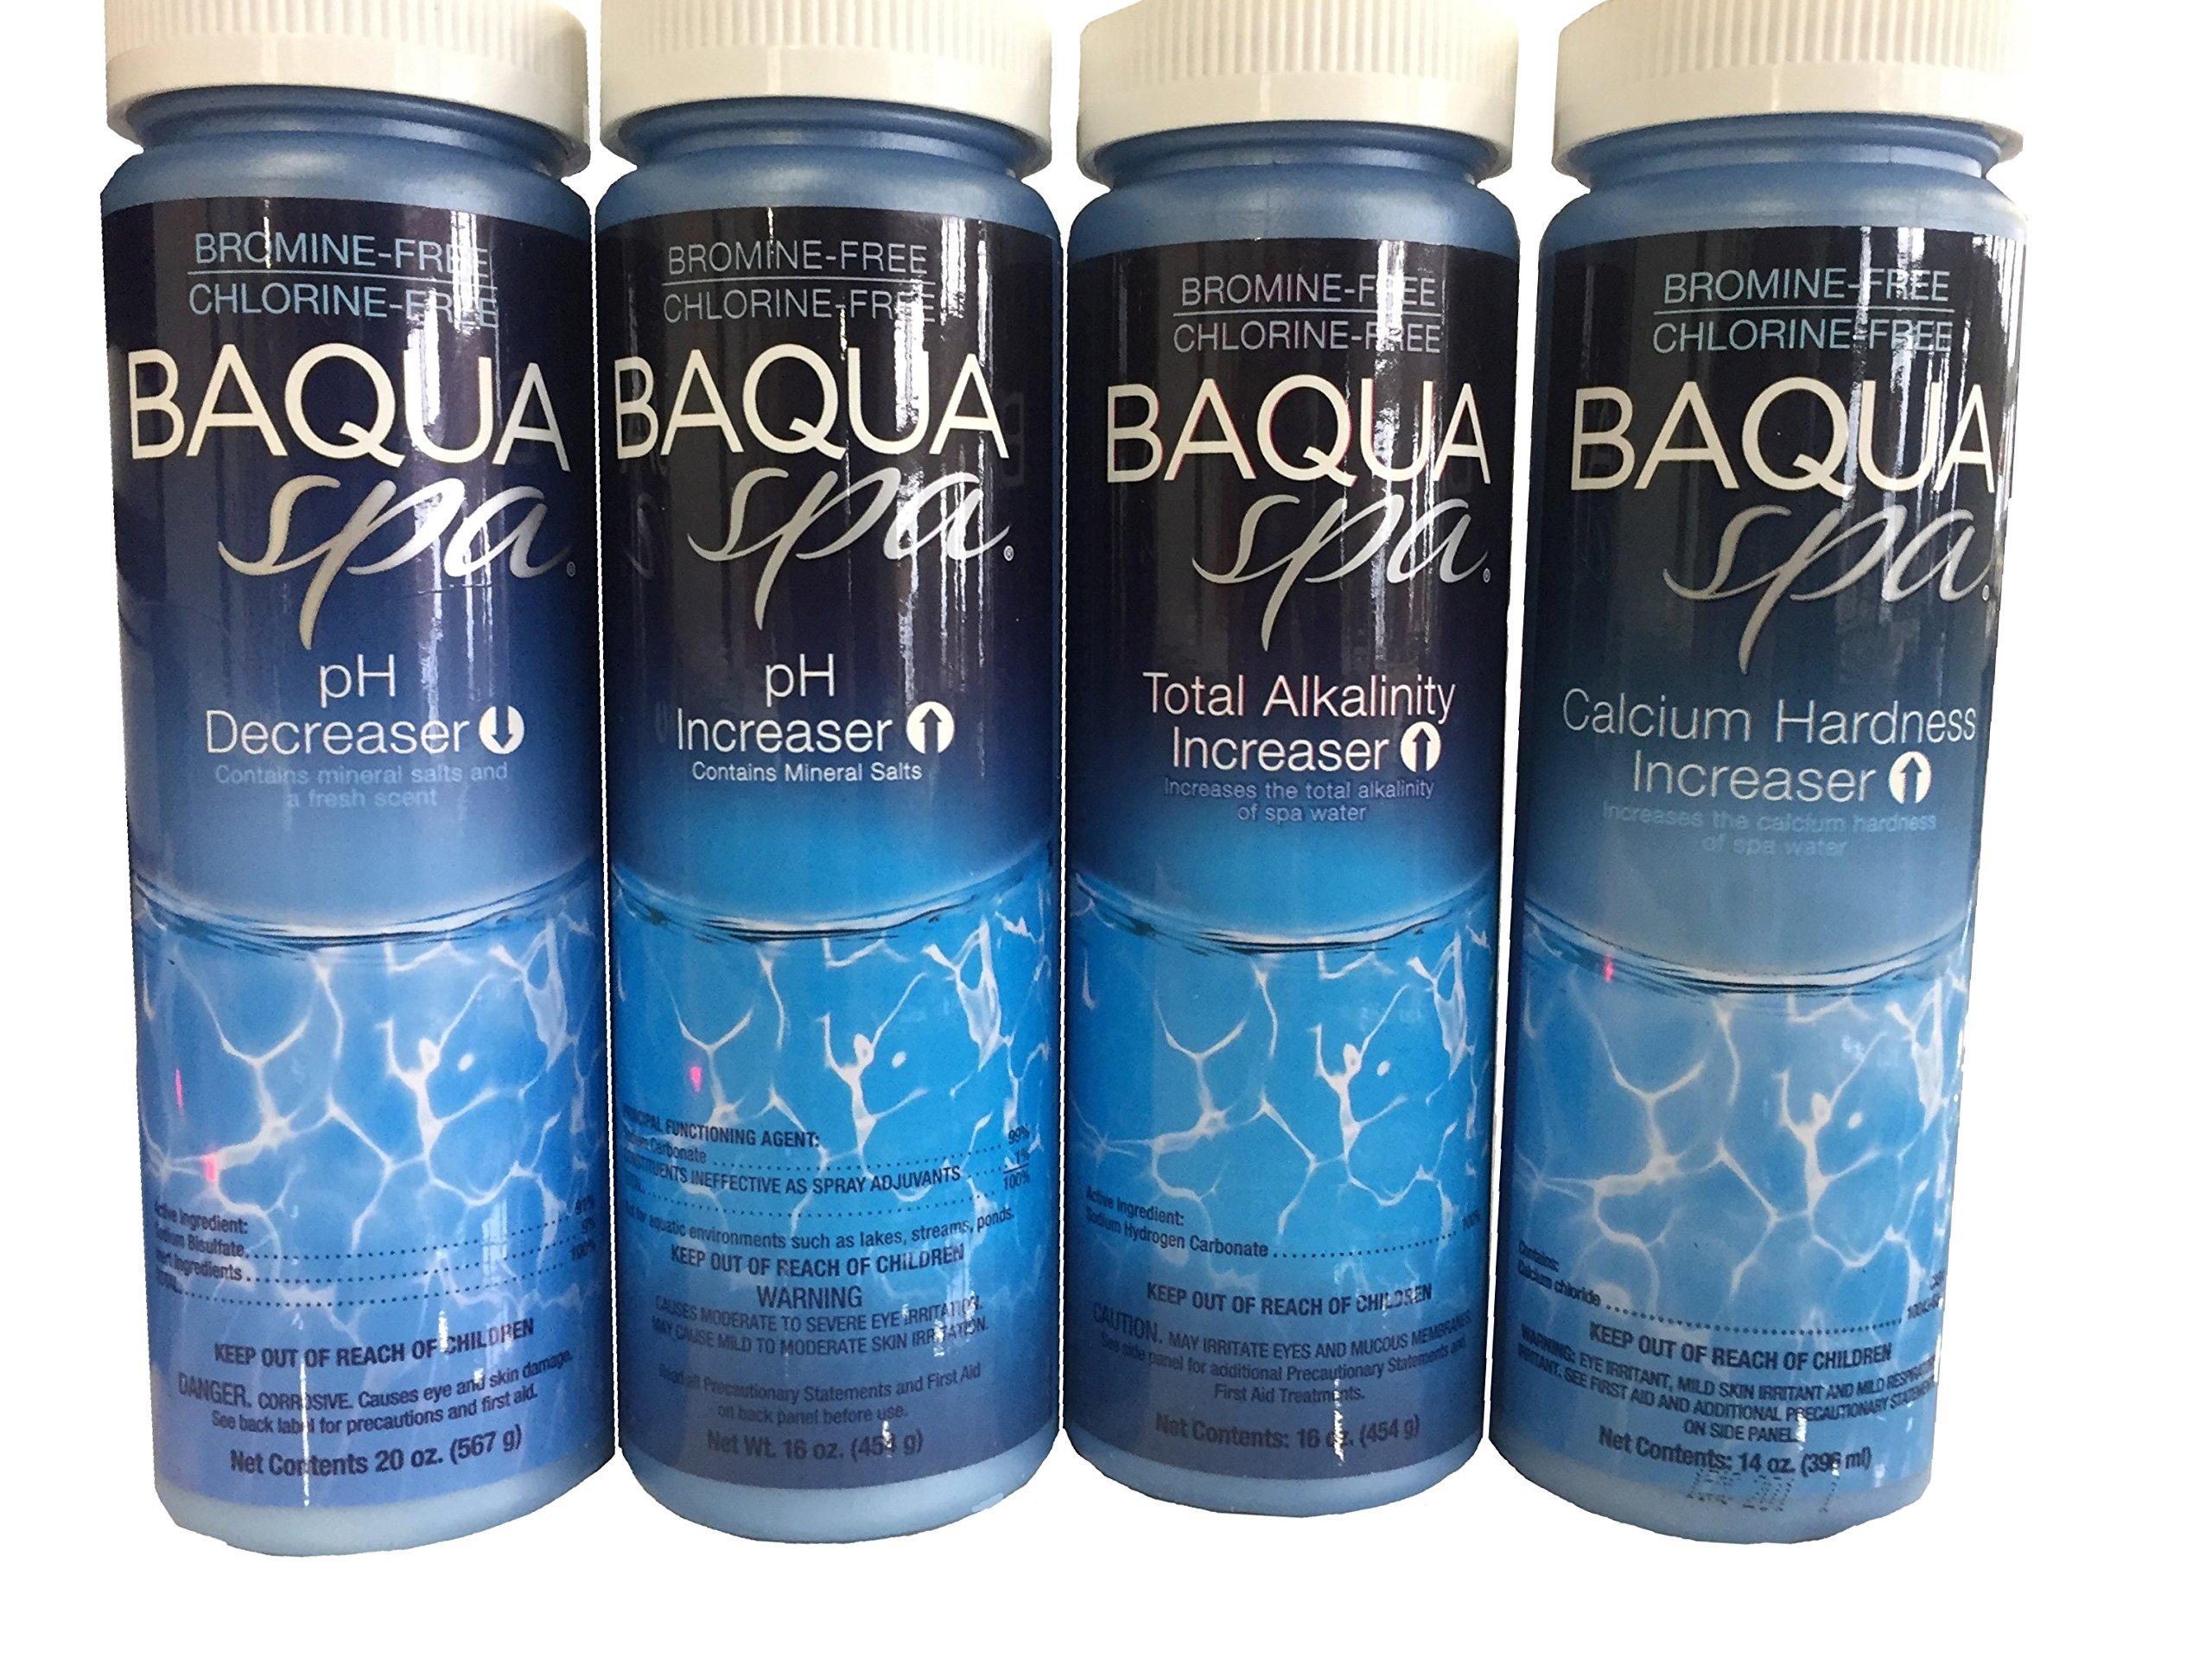 Baqua Spa Water Balancers with 3 Insparation 1/2 oz Sampler Packs by Baqua Spa